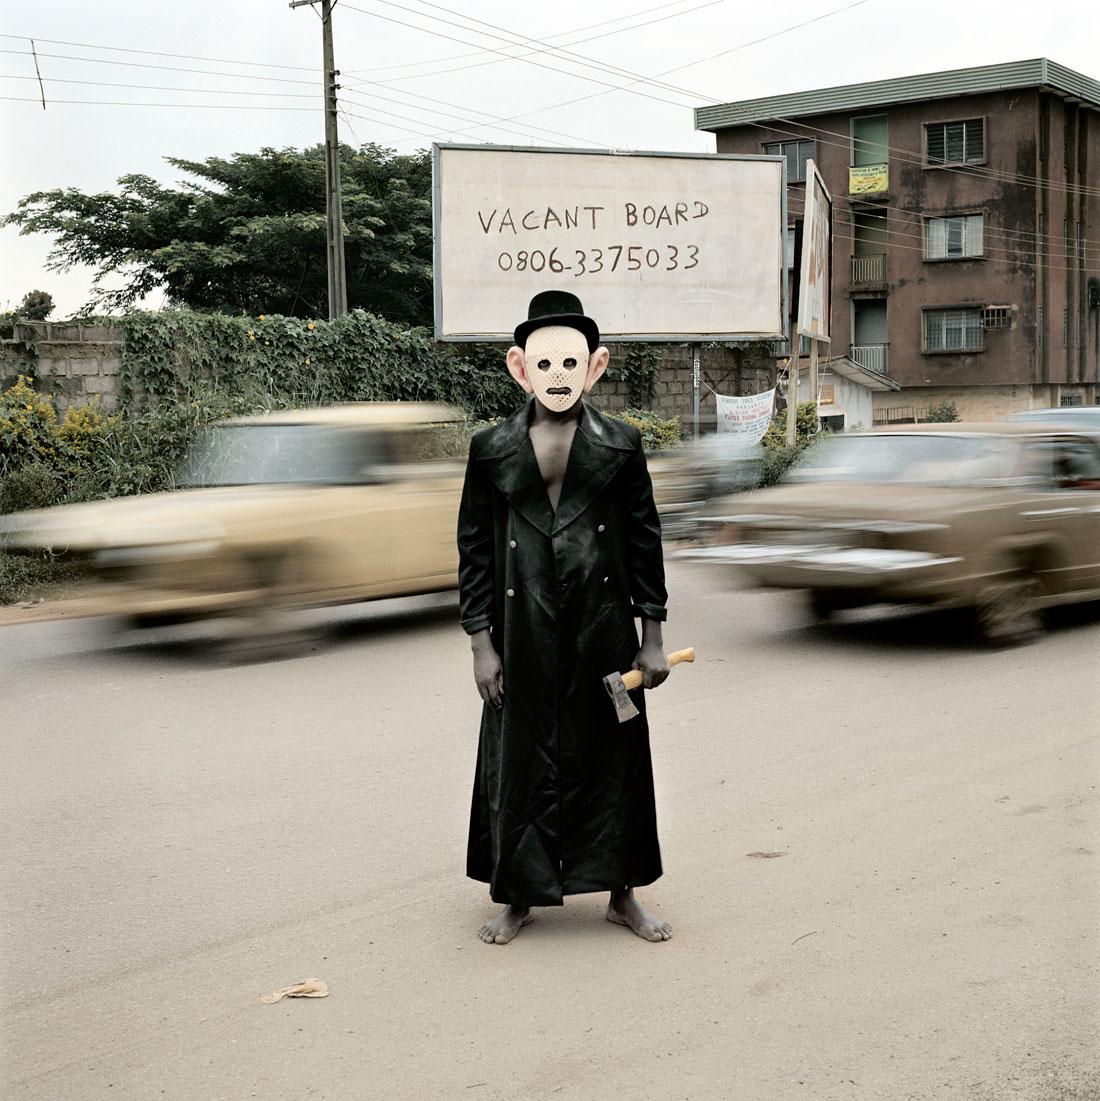 Pieter Hugo. 'Escort Kama, Enugu' From the series 'Nollywood' 2008-2009